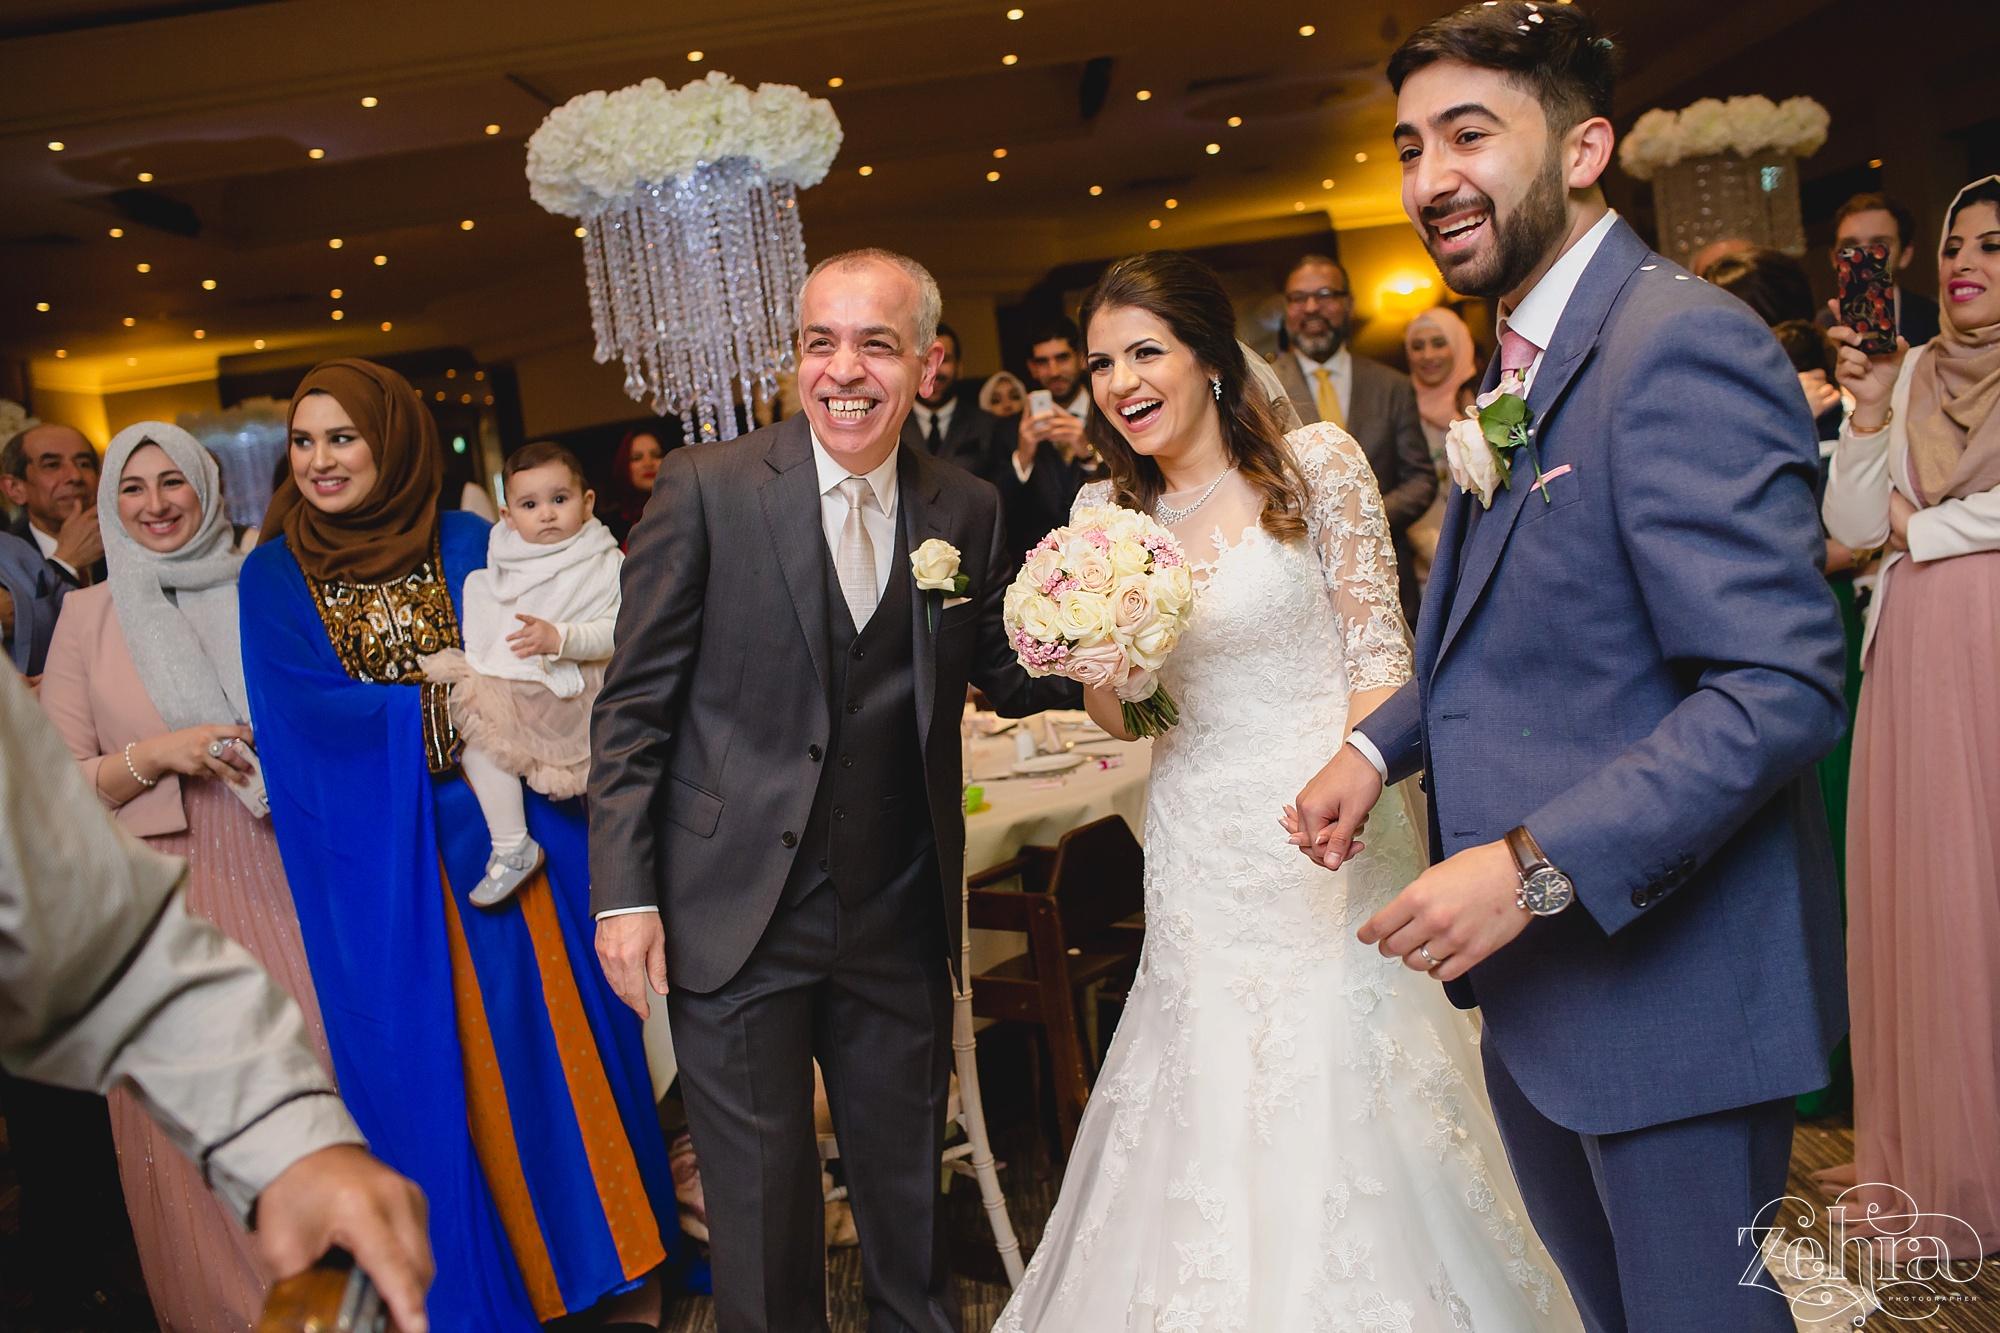 zehra photographer mere cheshire wedding_0032.jpg